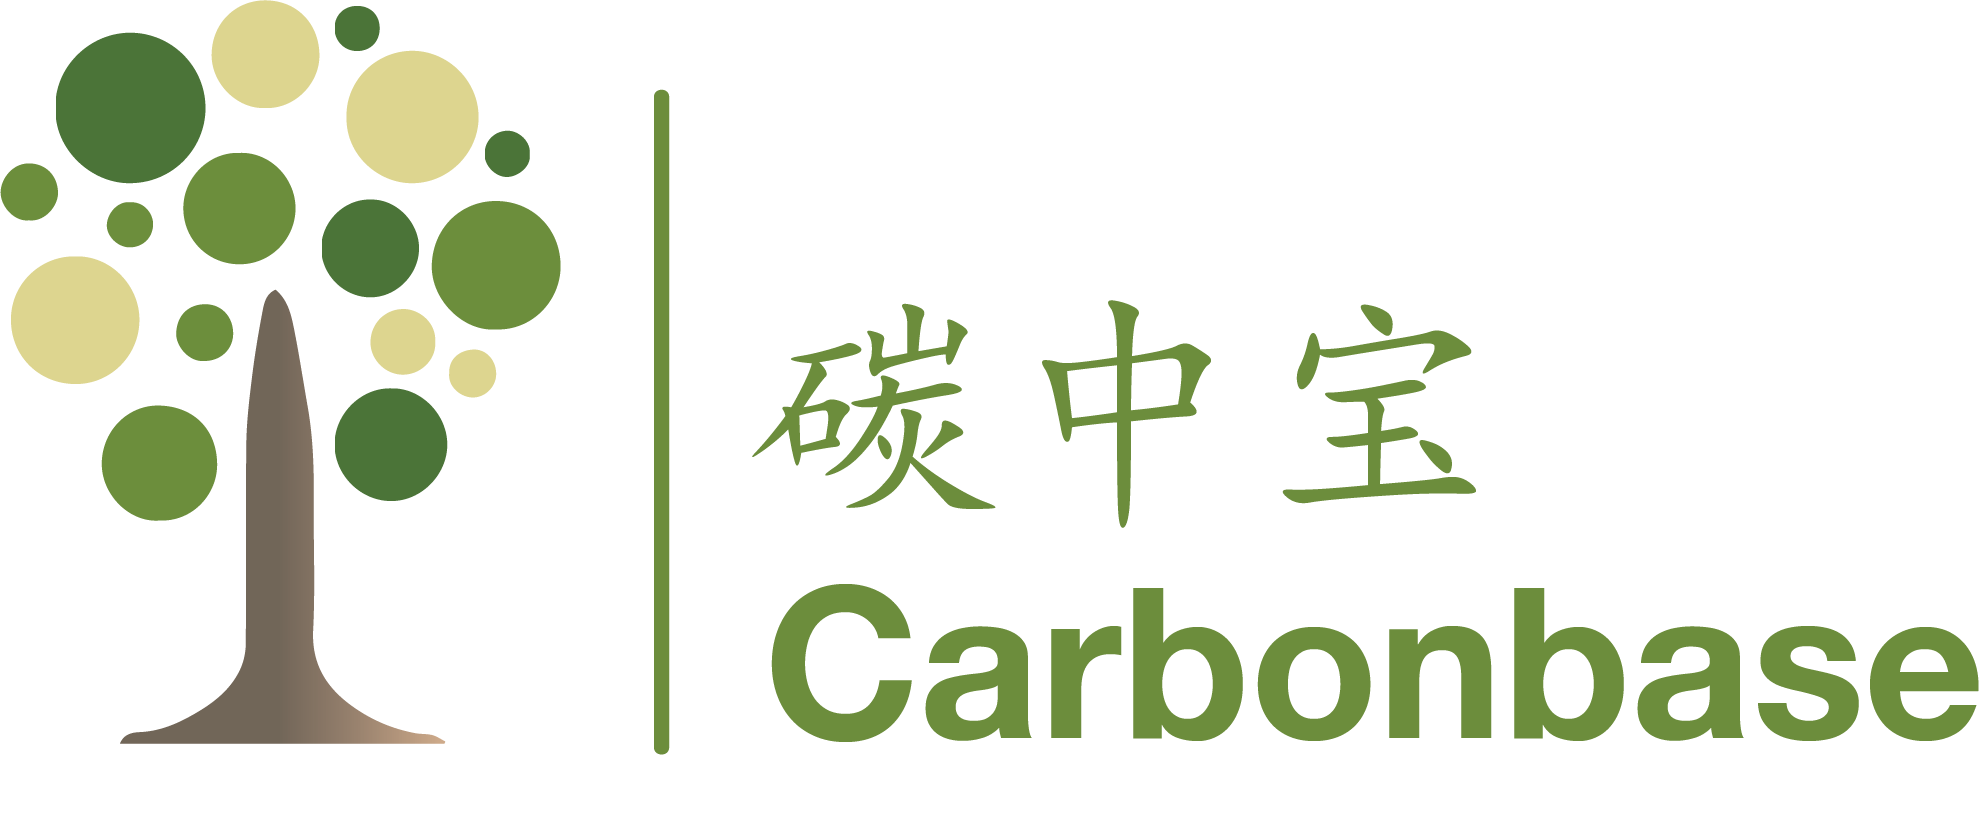 Carbonbase + Logo (中英)